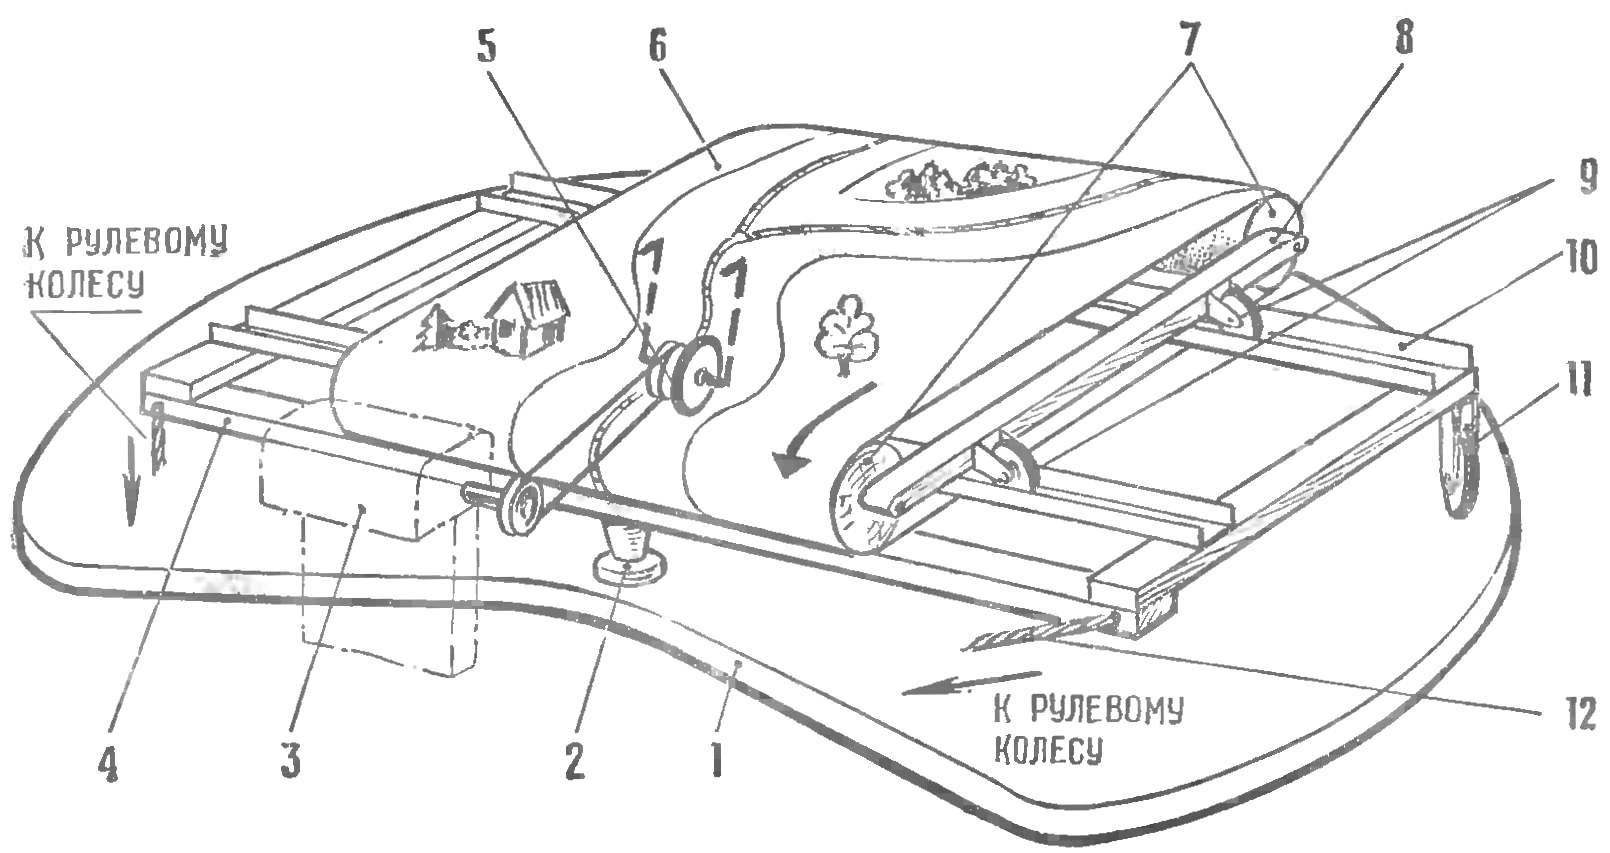 Fig. 1. Device of auto-simulator